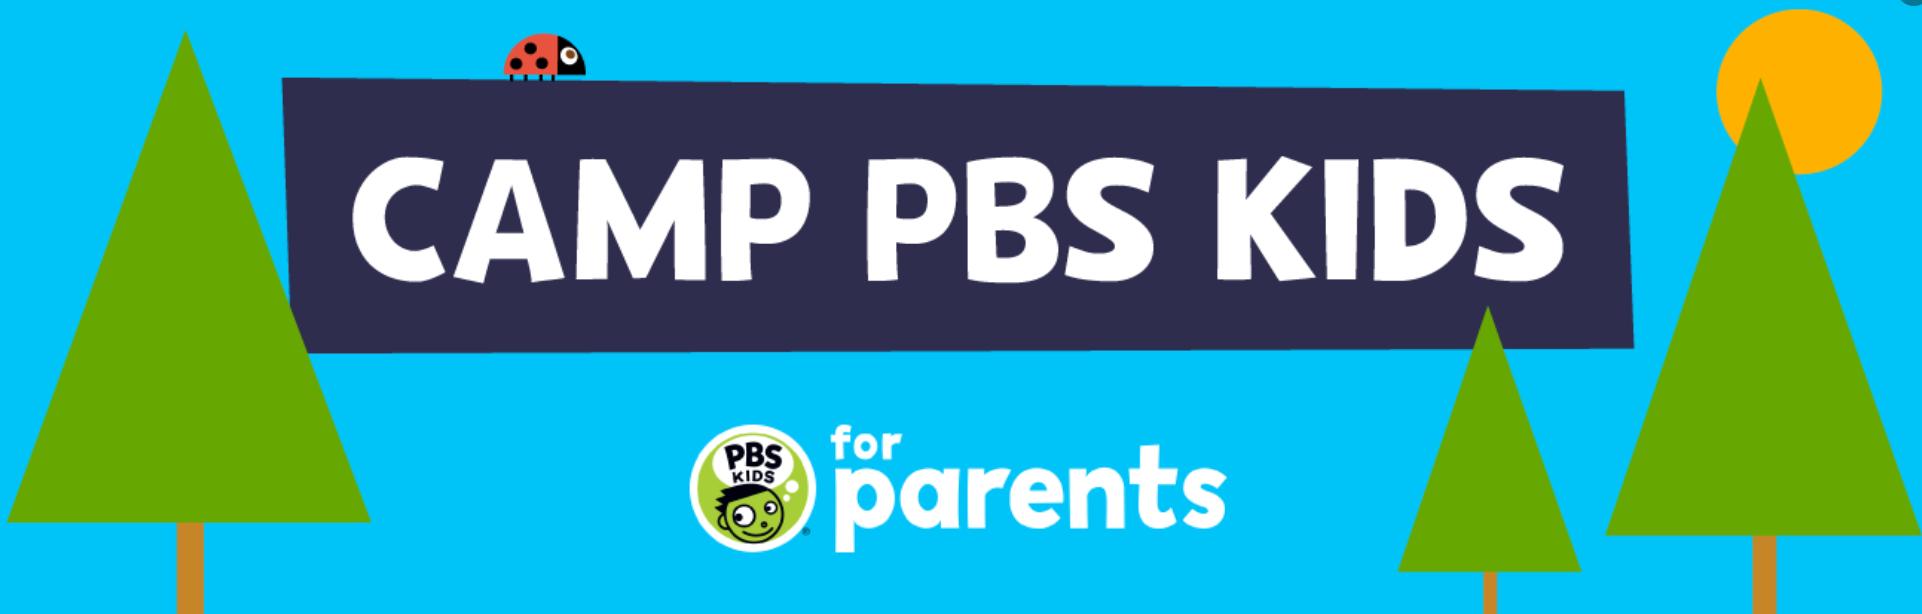 Camp PBS Kids